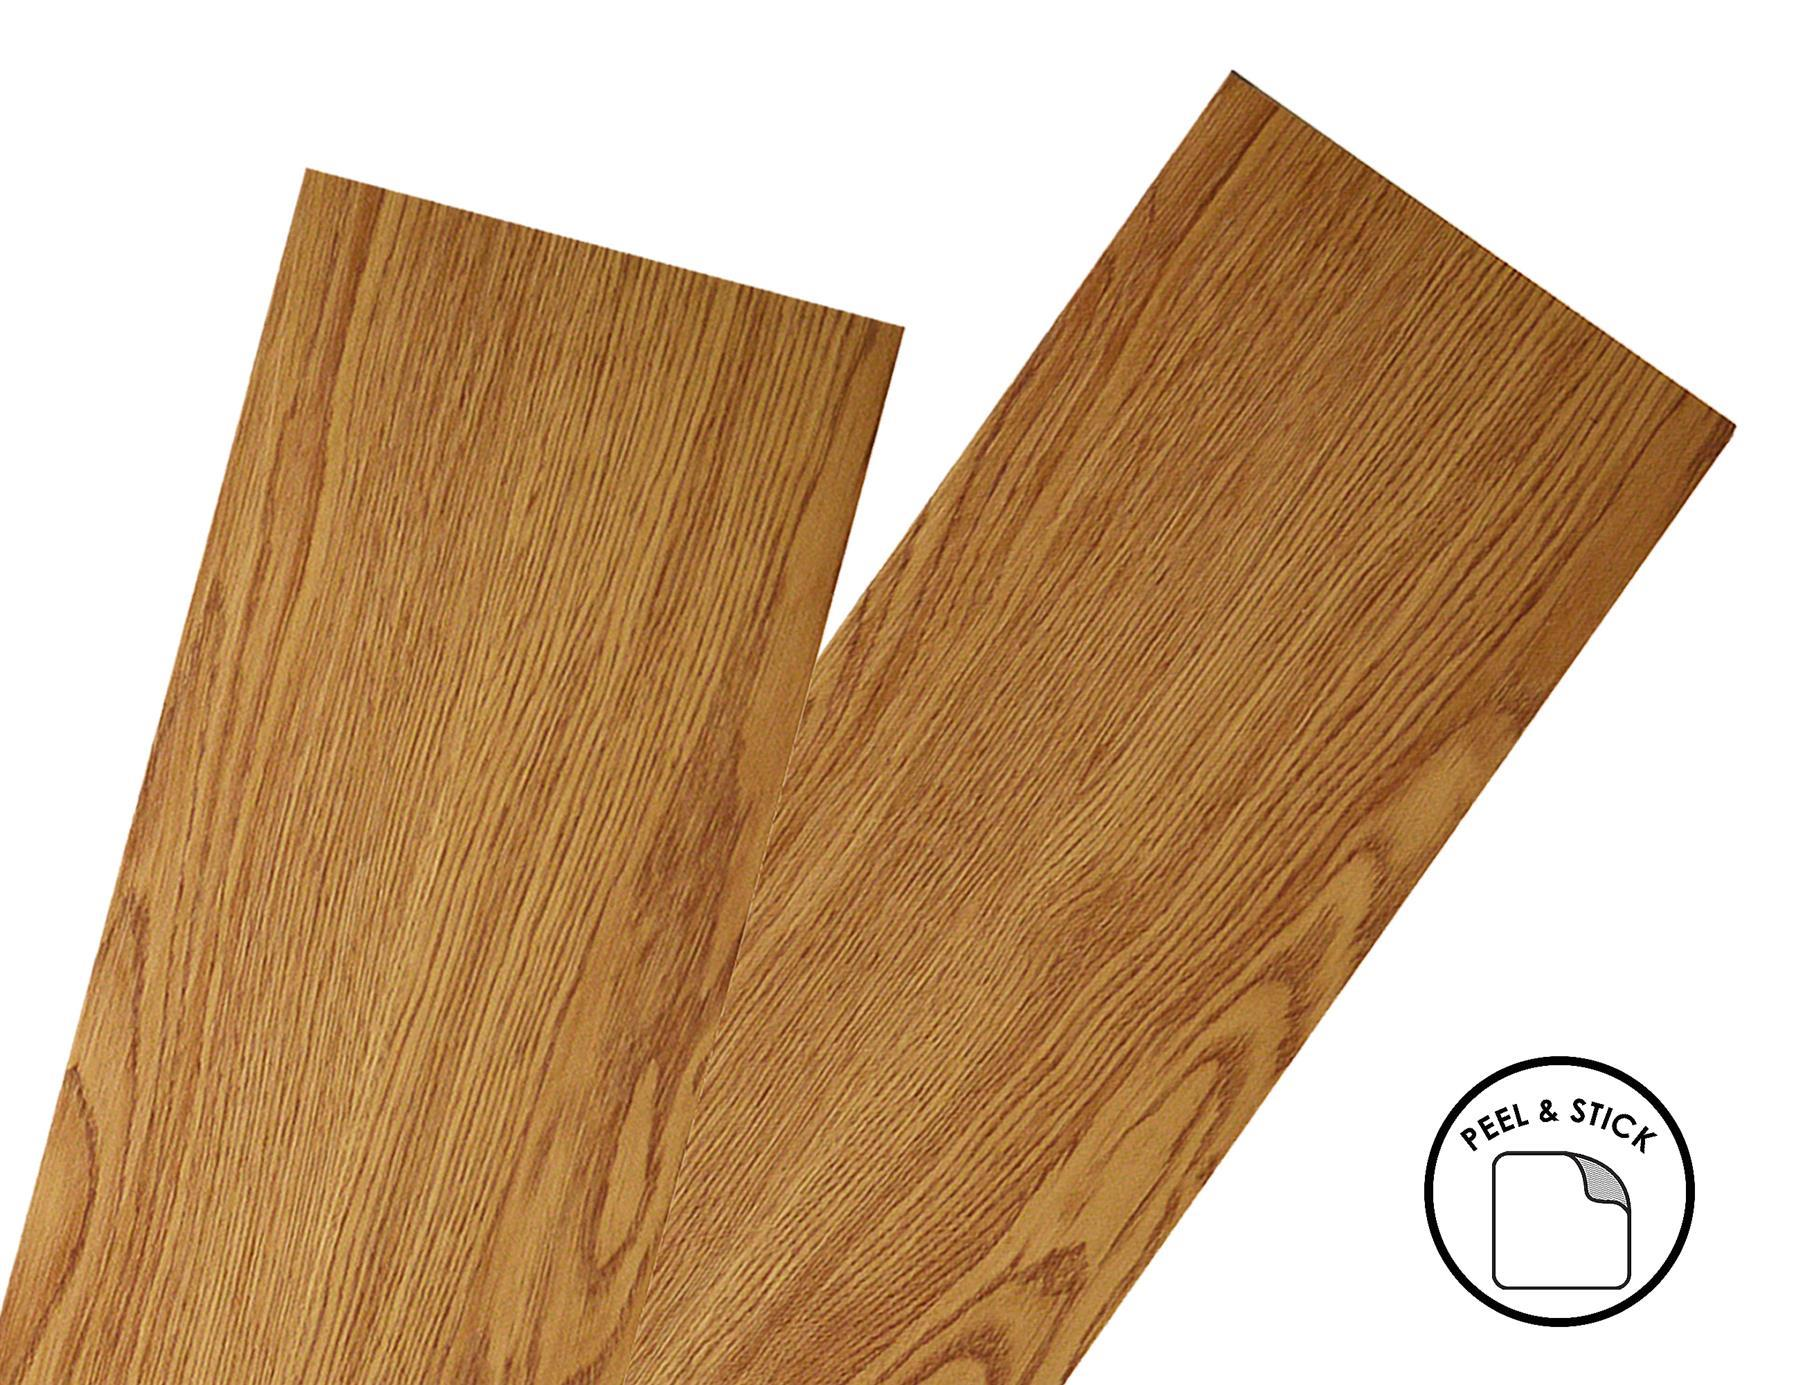 thumbnail 5 - Floor Planks Tiles Self Adhesive Vinyl Brown Wood Flooring Kitchen Bathroom